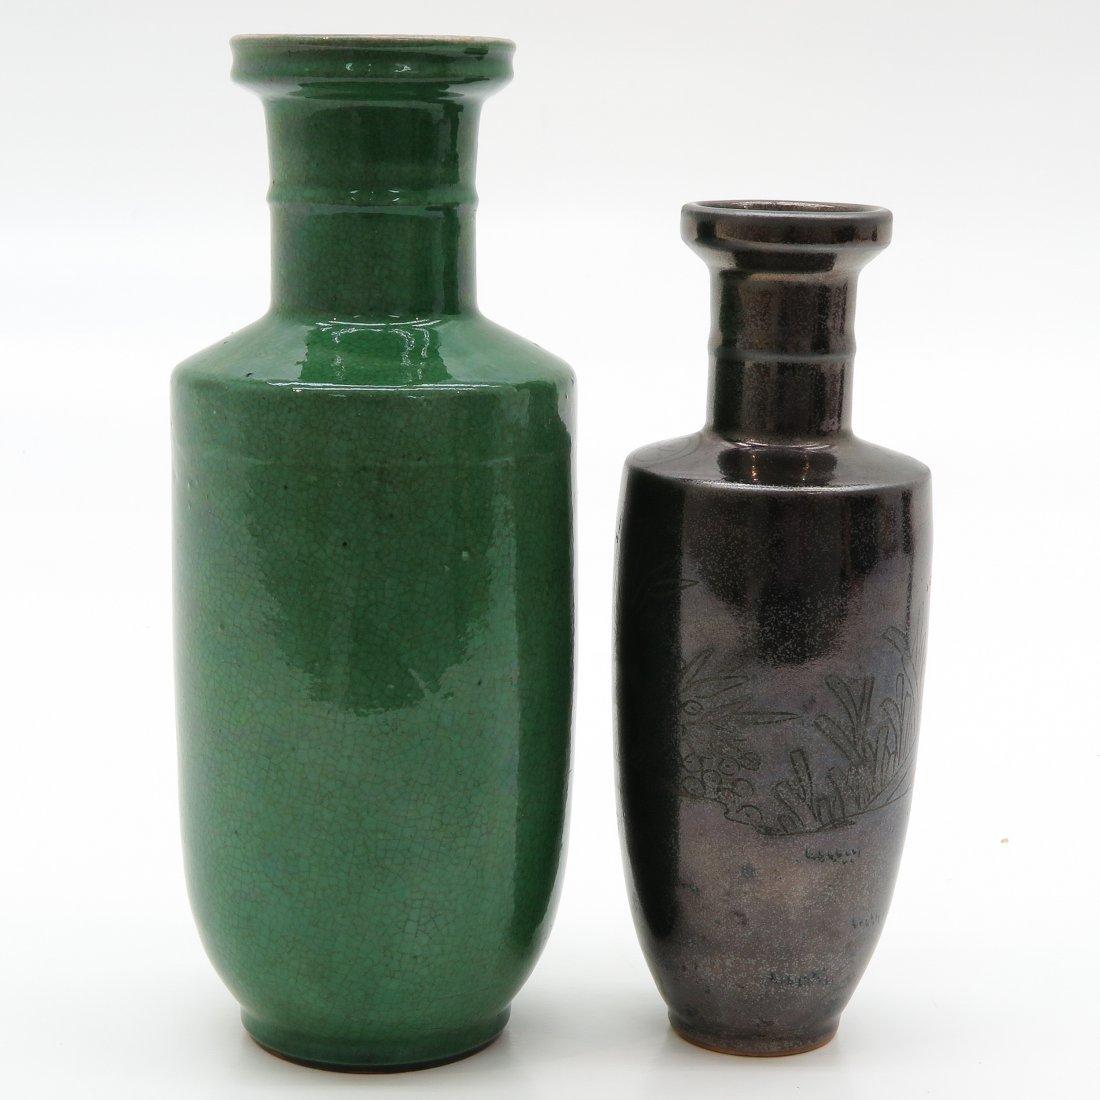 Lot of 2 China Porcelain Vases - 2